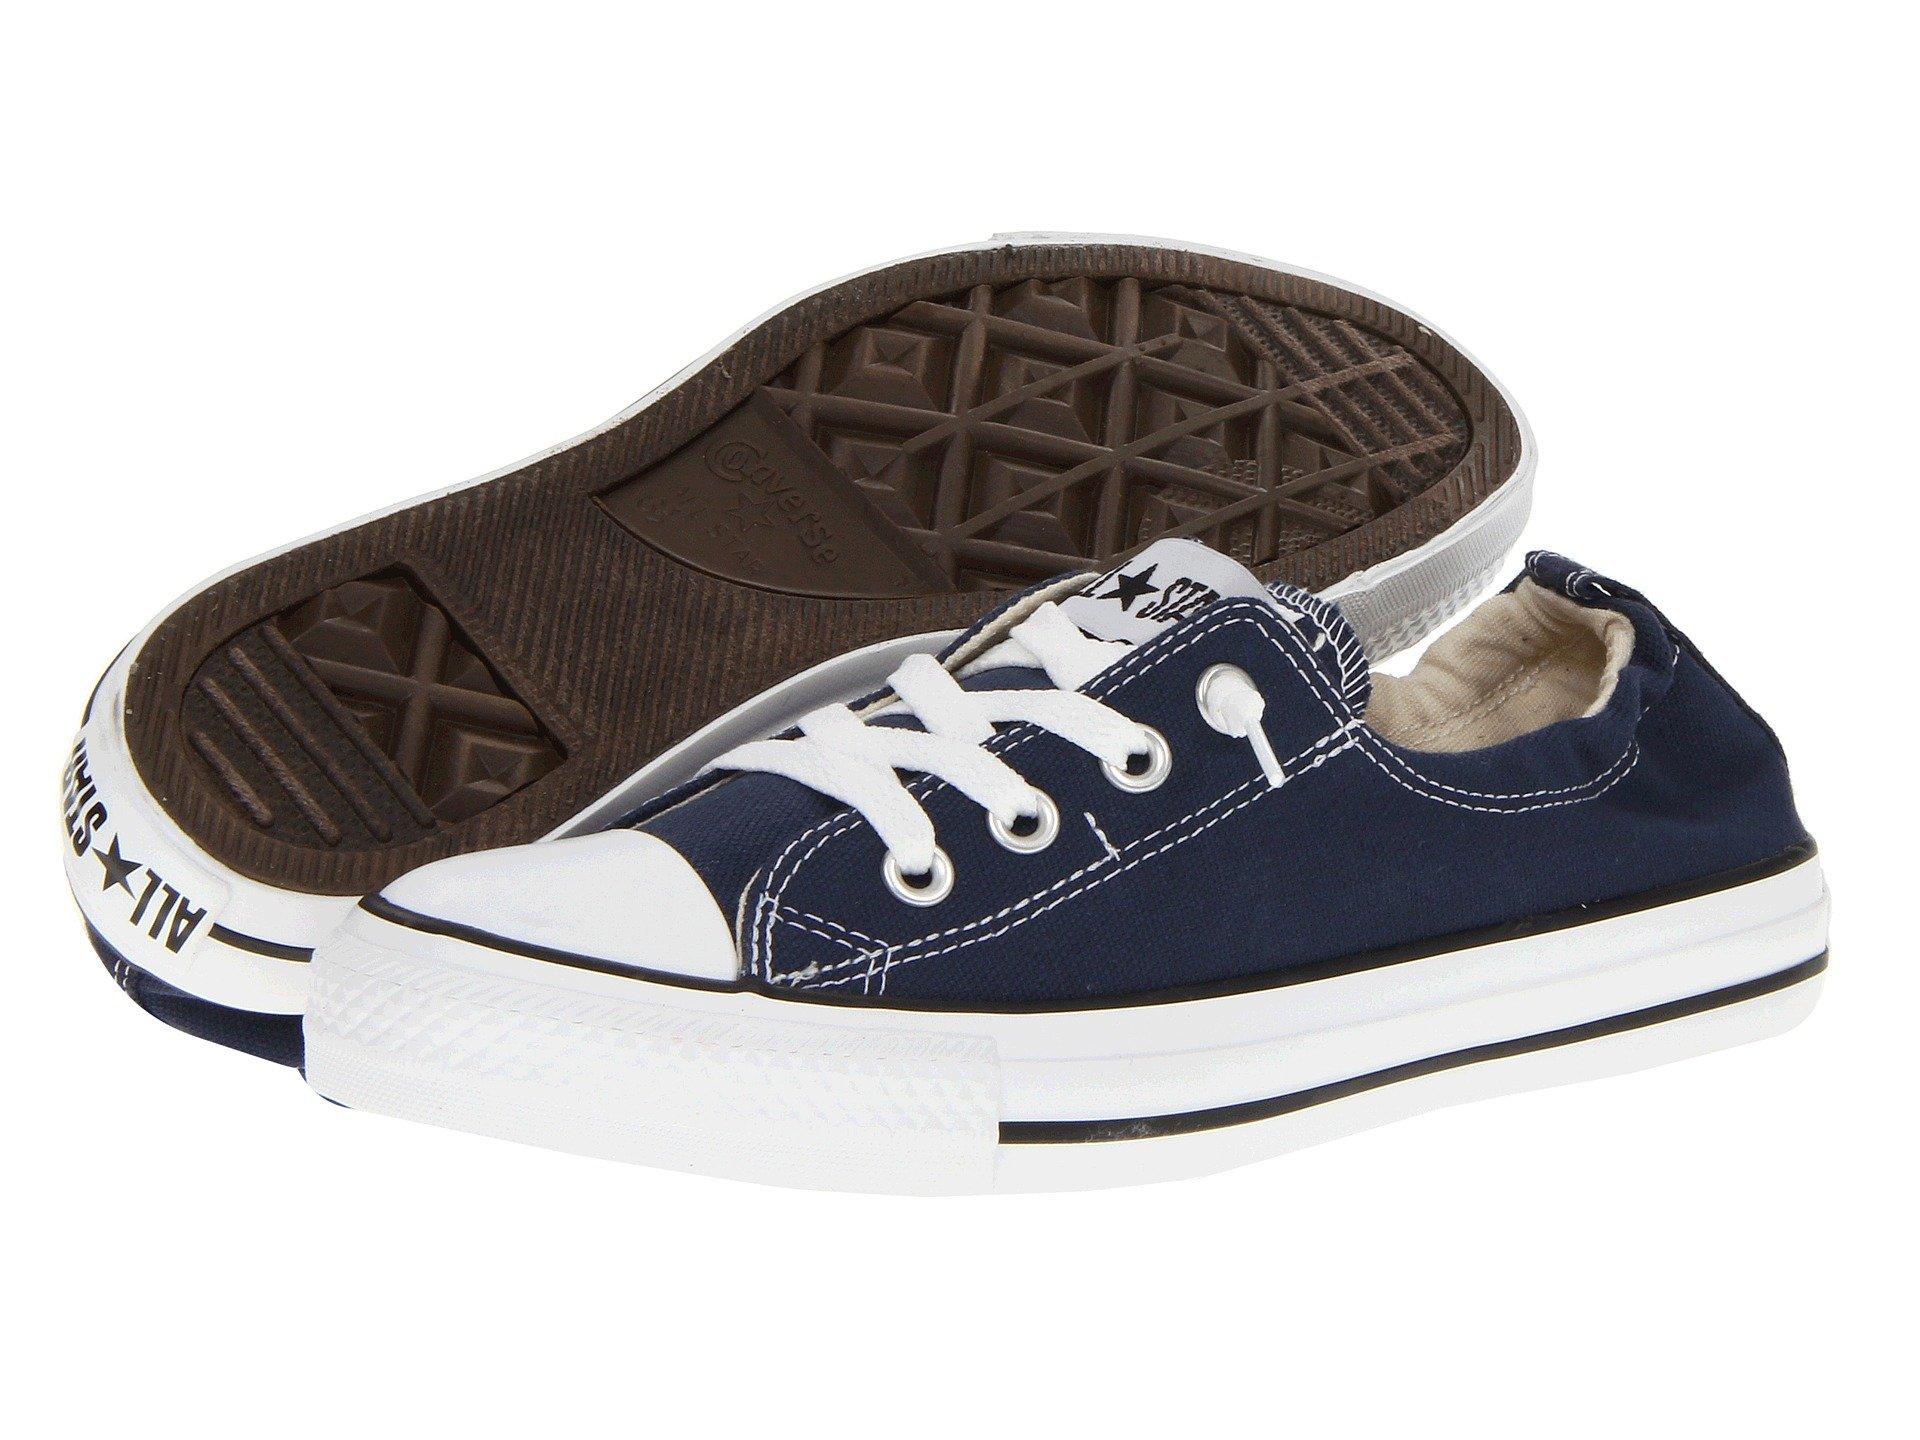 be5e1b8a5188df Galleon - Converse Women Shoreline Slip On Sneaker